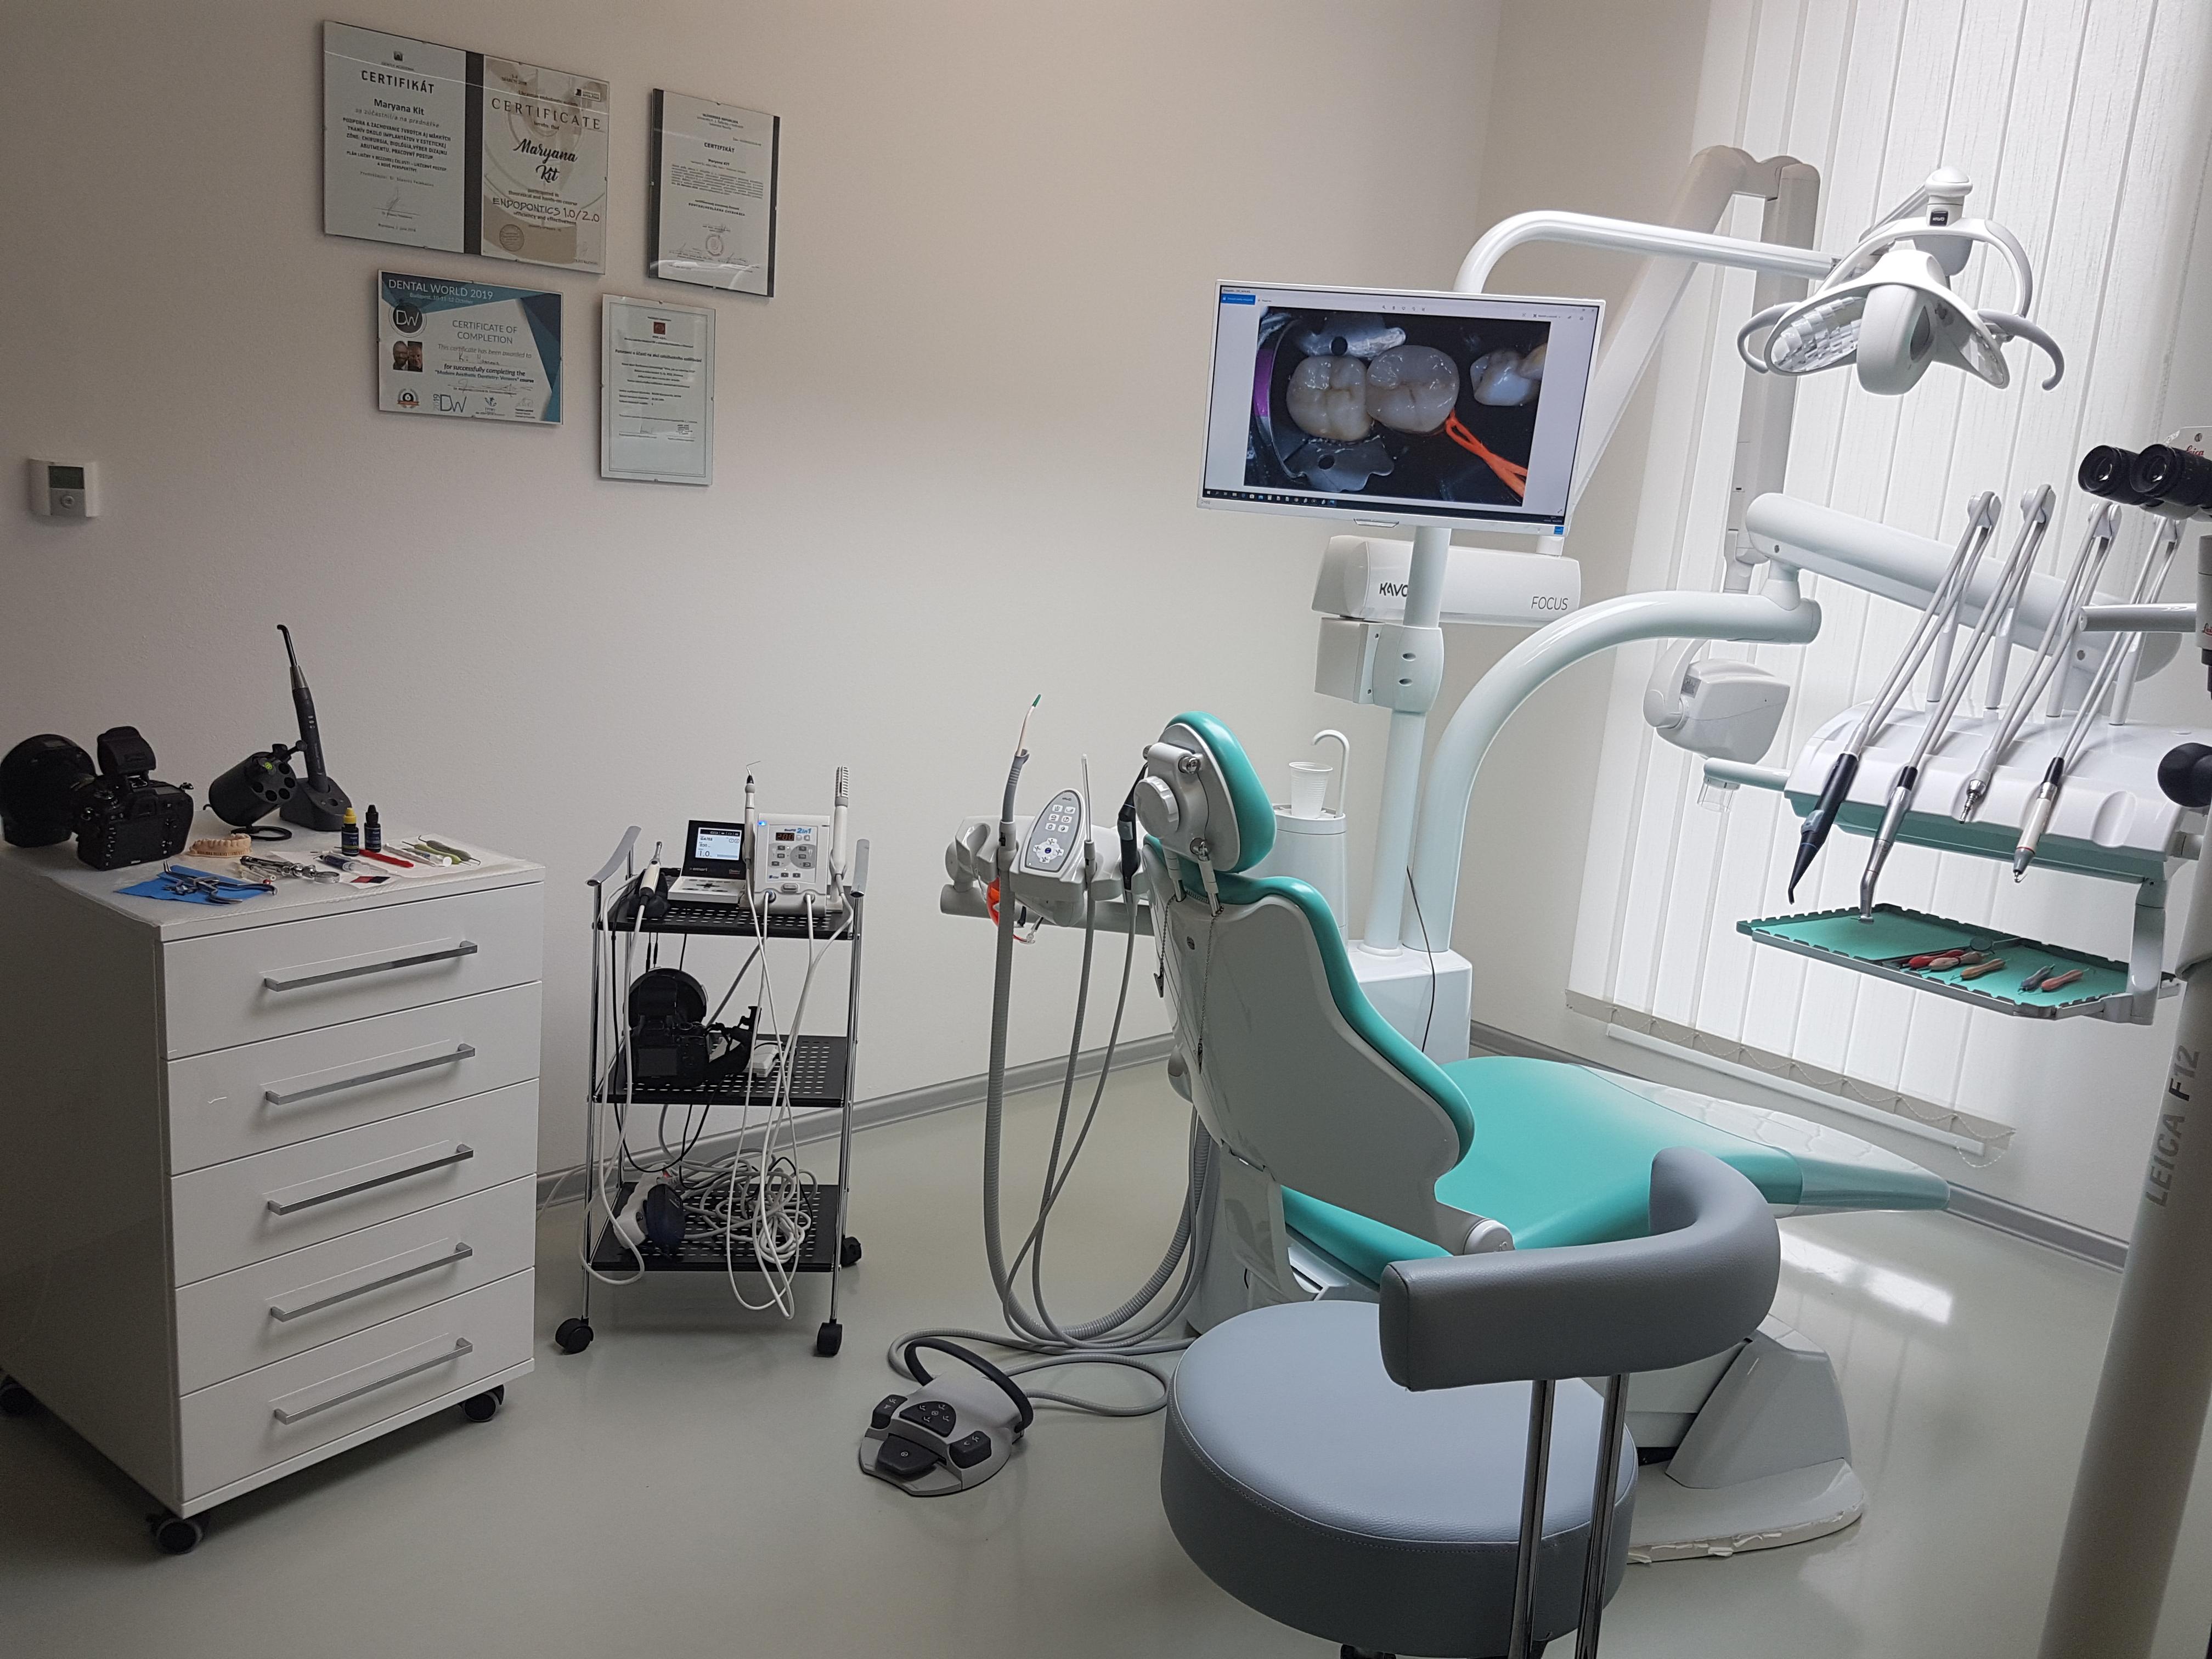 ambulancia dentalclinic tri veže